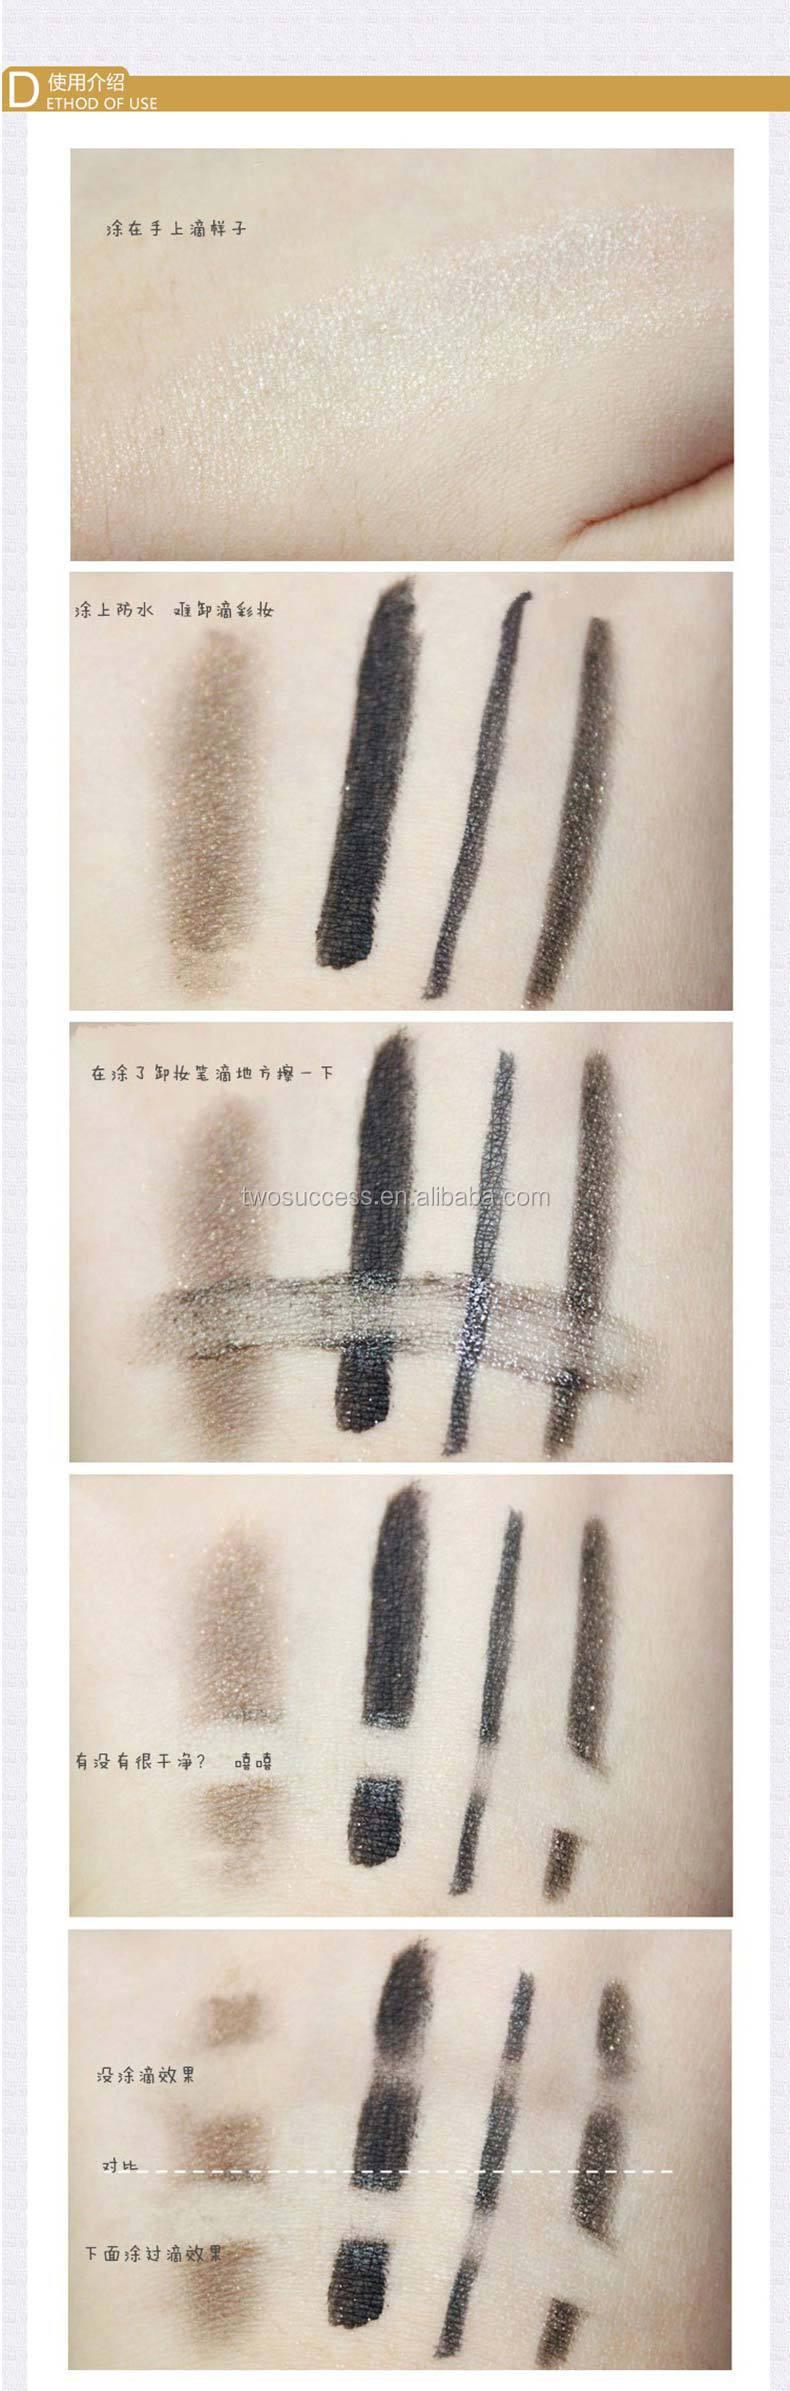 makeup remover pen.jpg